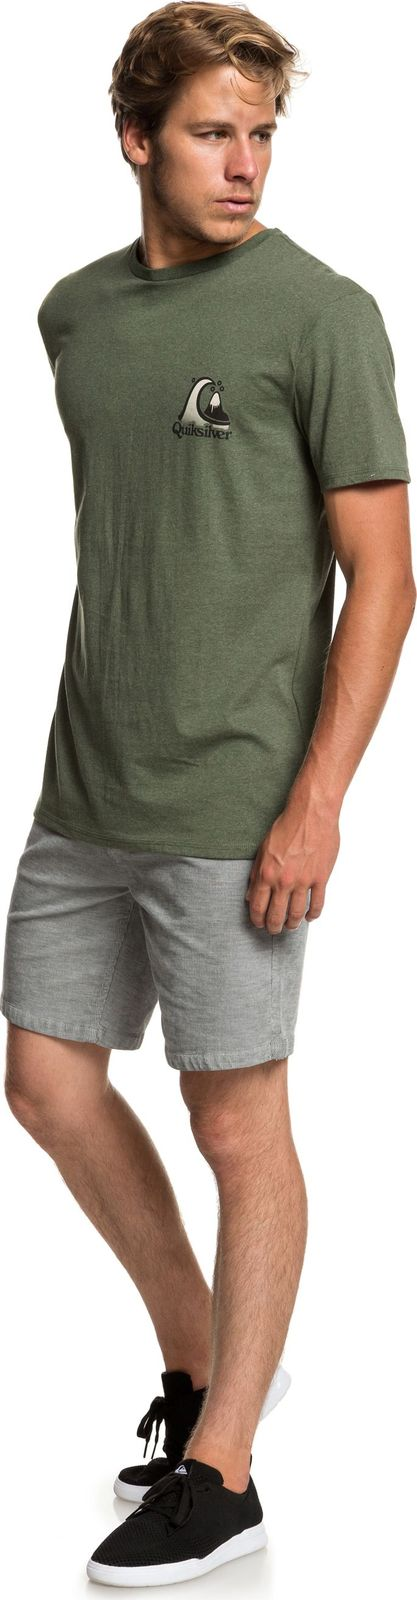 Футболка Quiksilver Captainslimss футболка мужская quiksilver captainslimss цвет зеленый серый eqyzt05229 kzeh размер m 46 48